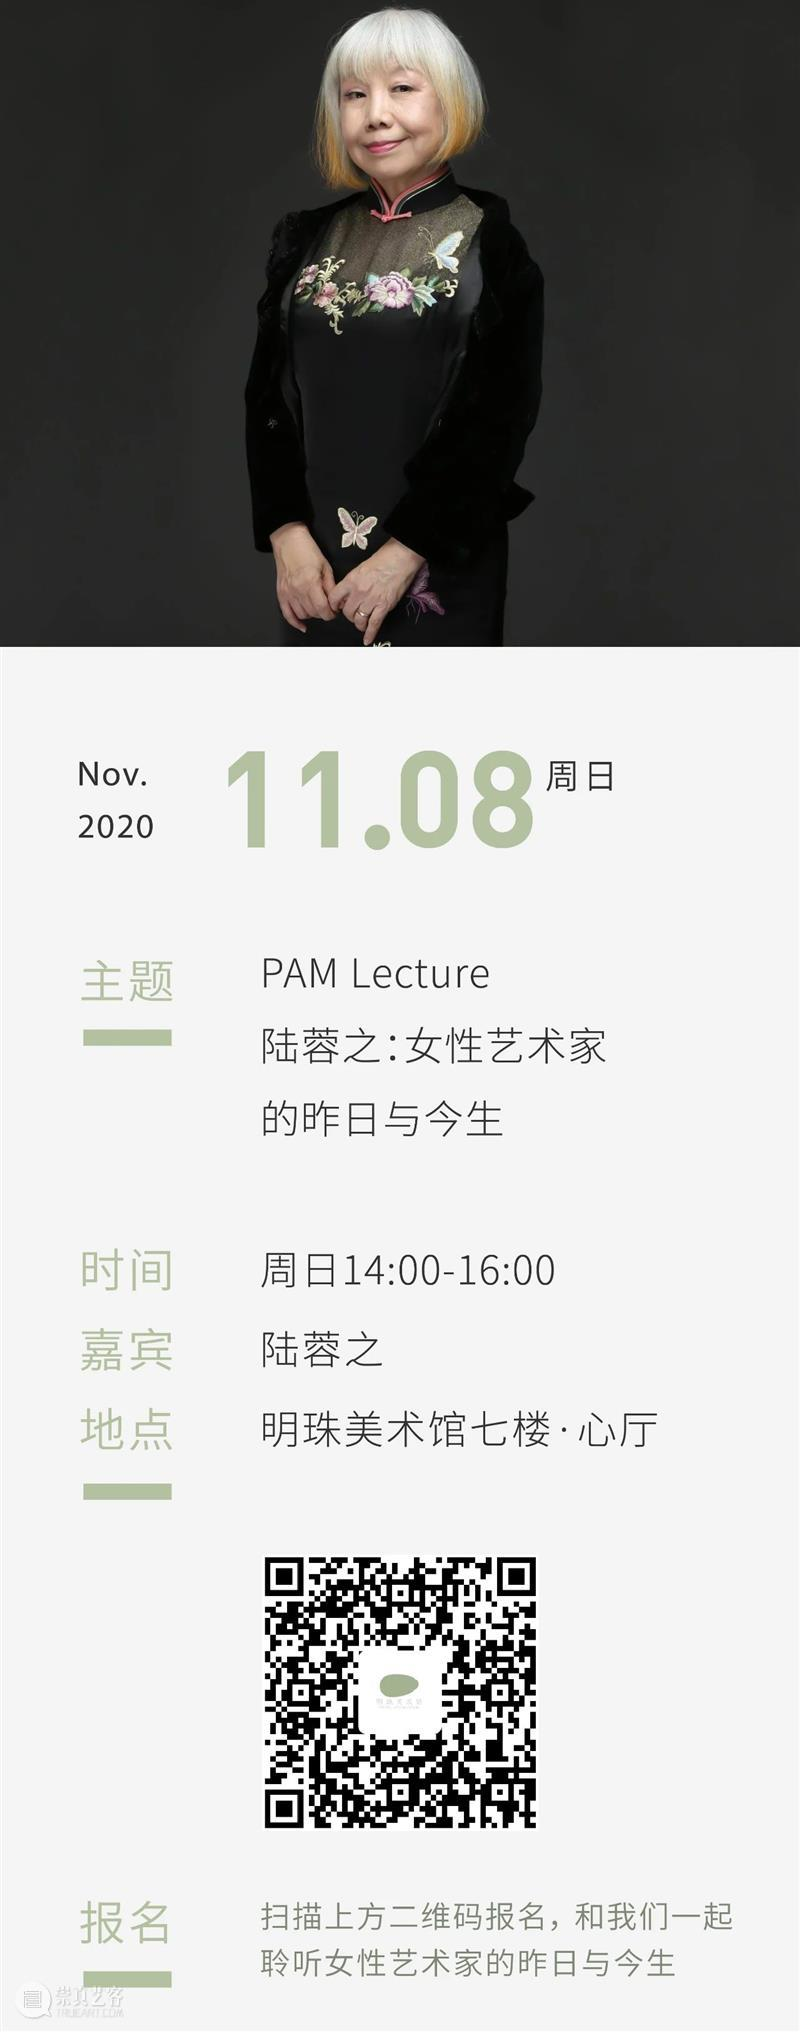 PAM Lecture|陆蓉之:女性艺术家的昨日与今生 女性 艺术家 陆蓉之 今生 PAM Lecture 正在明珠美术馆 艺术群展 艾敬 毕蓉蓉 崇真艺客